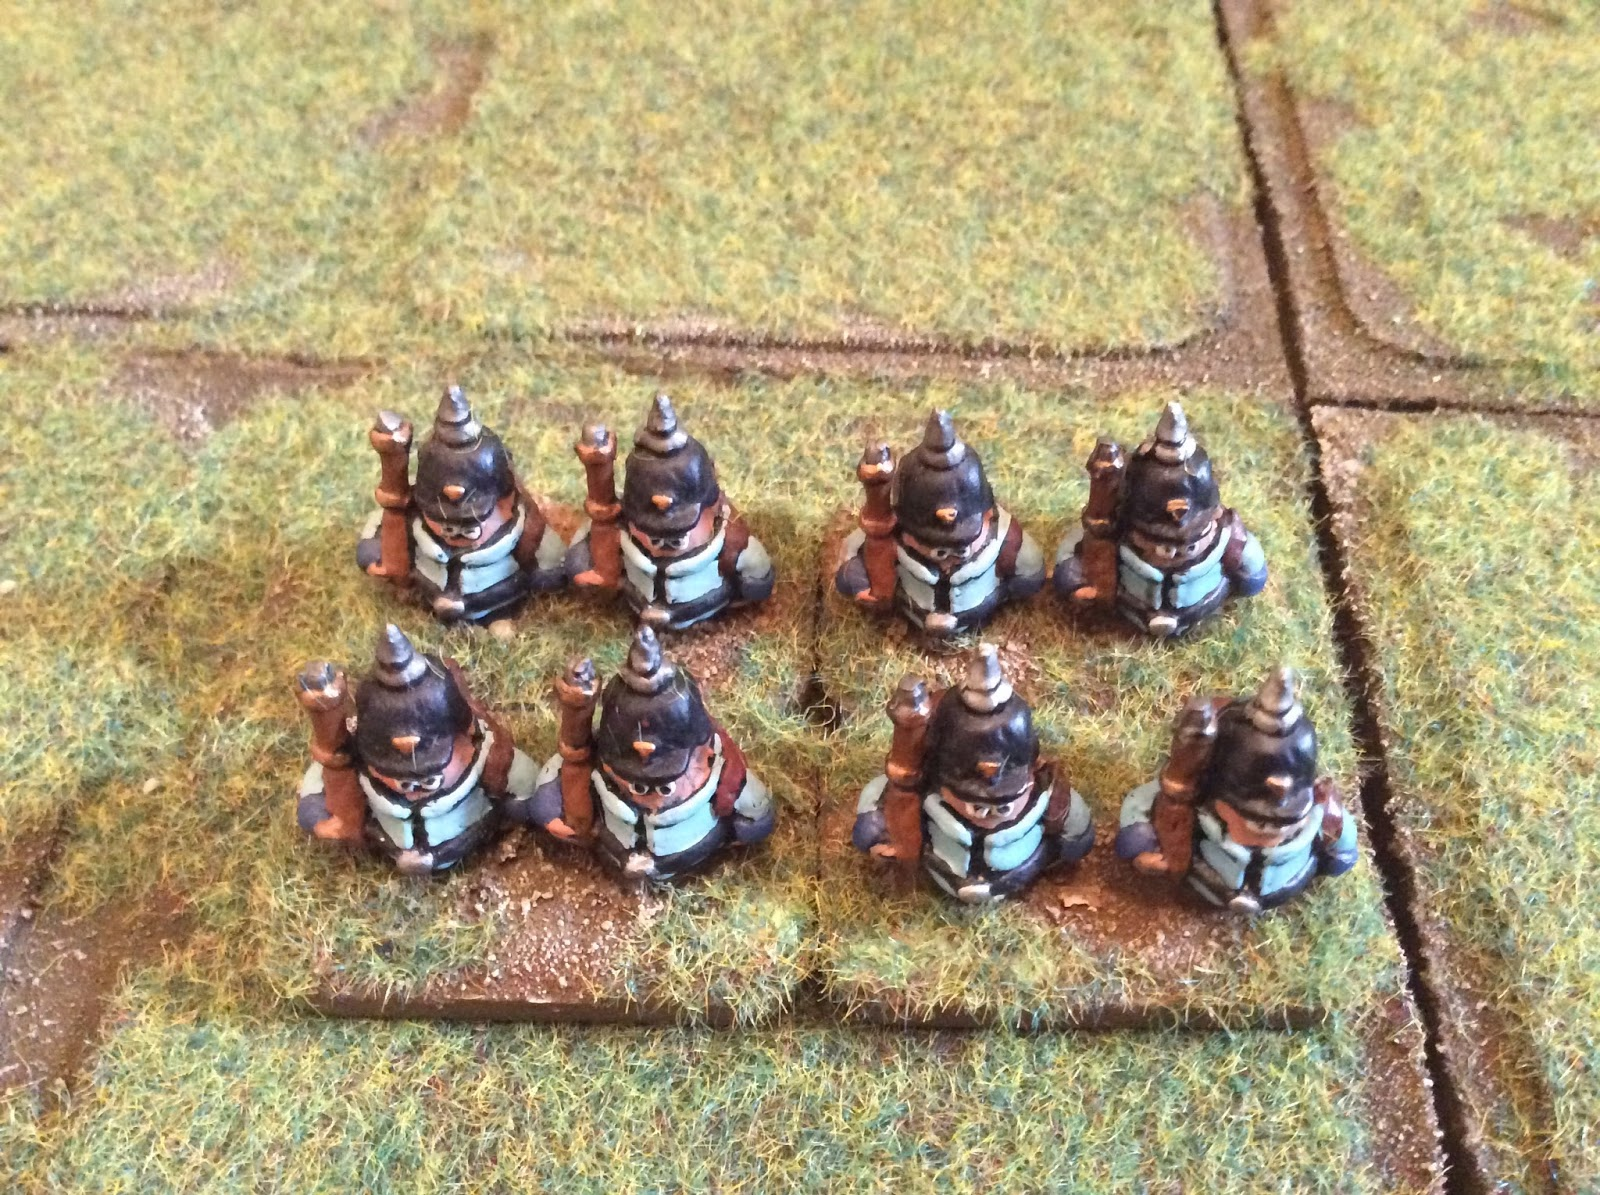 Bomenburst Infantry